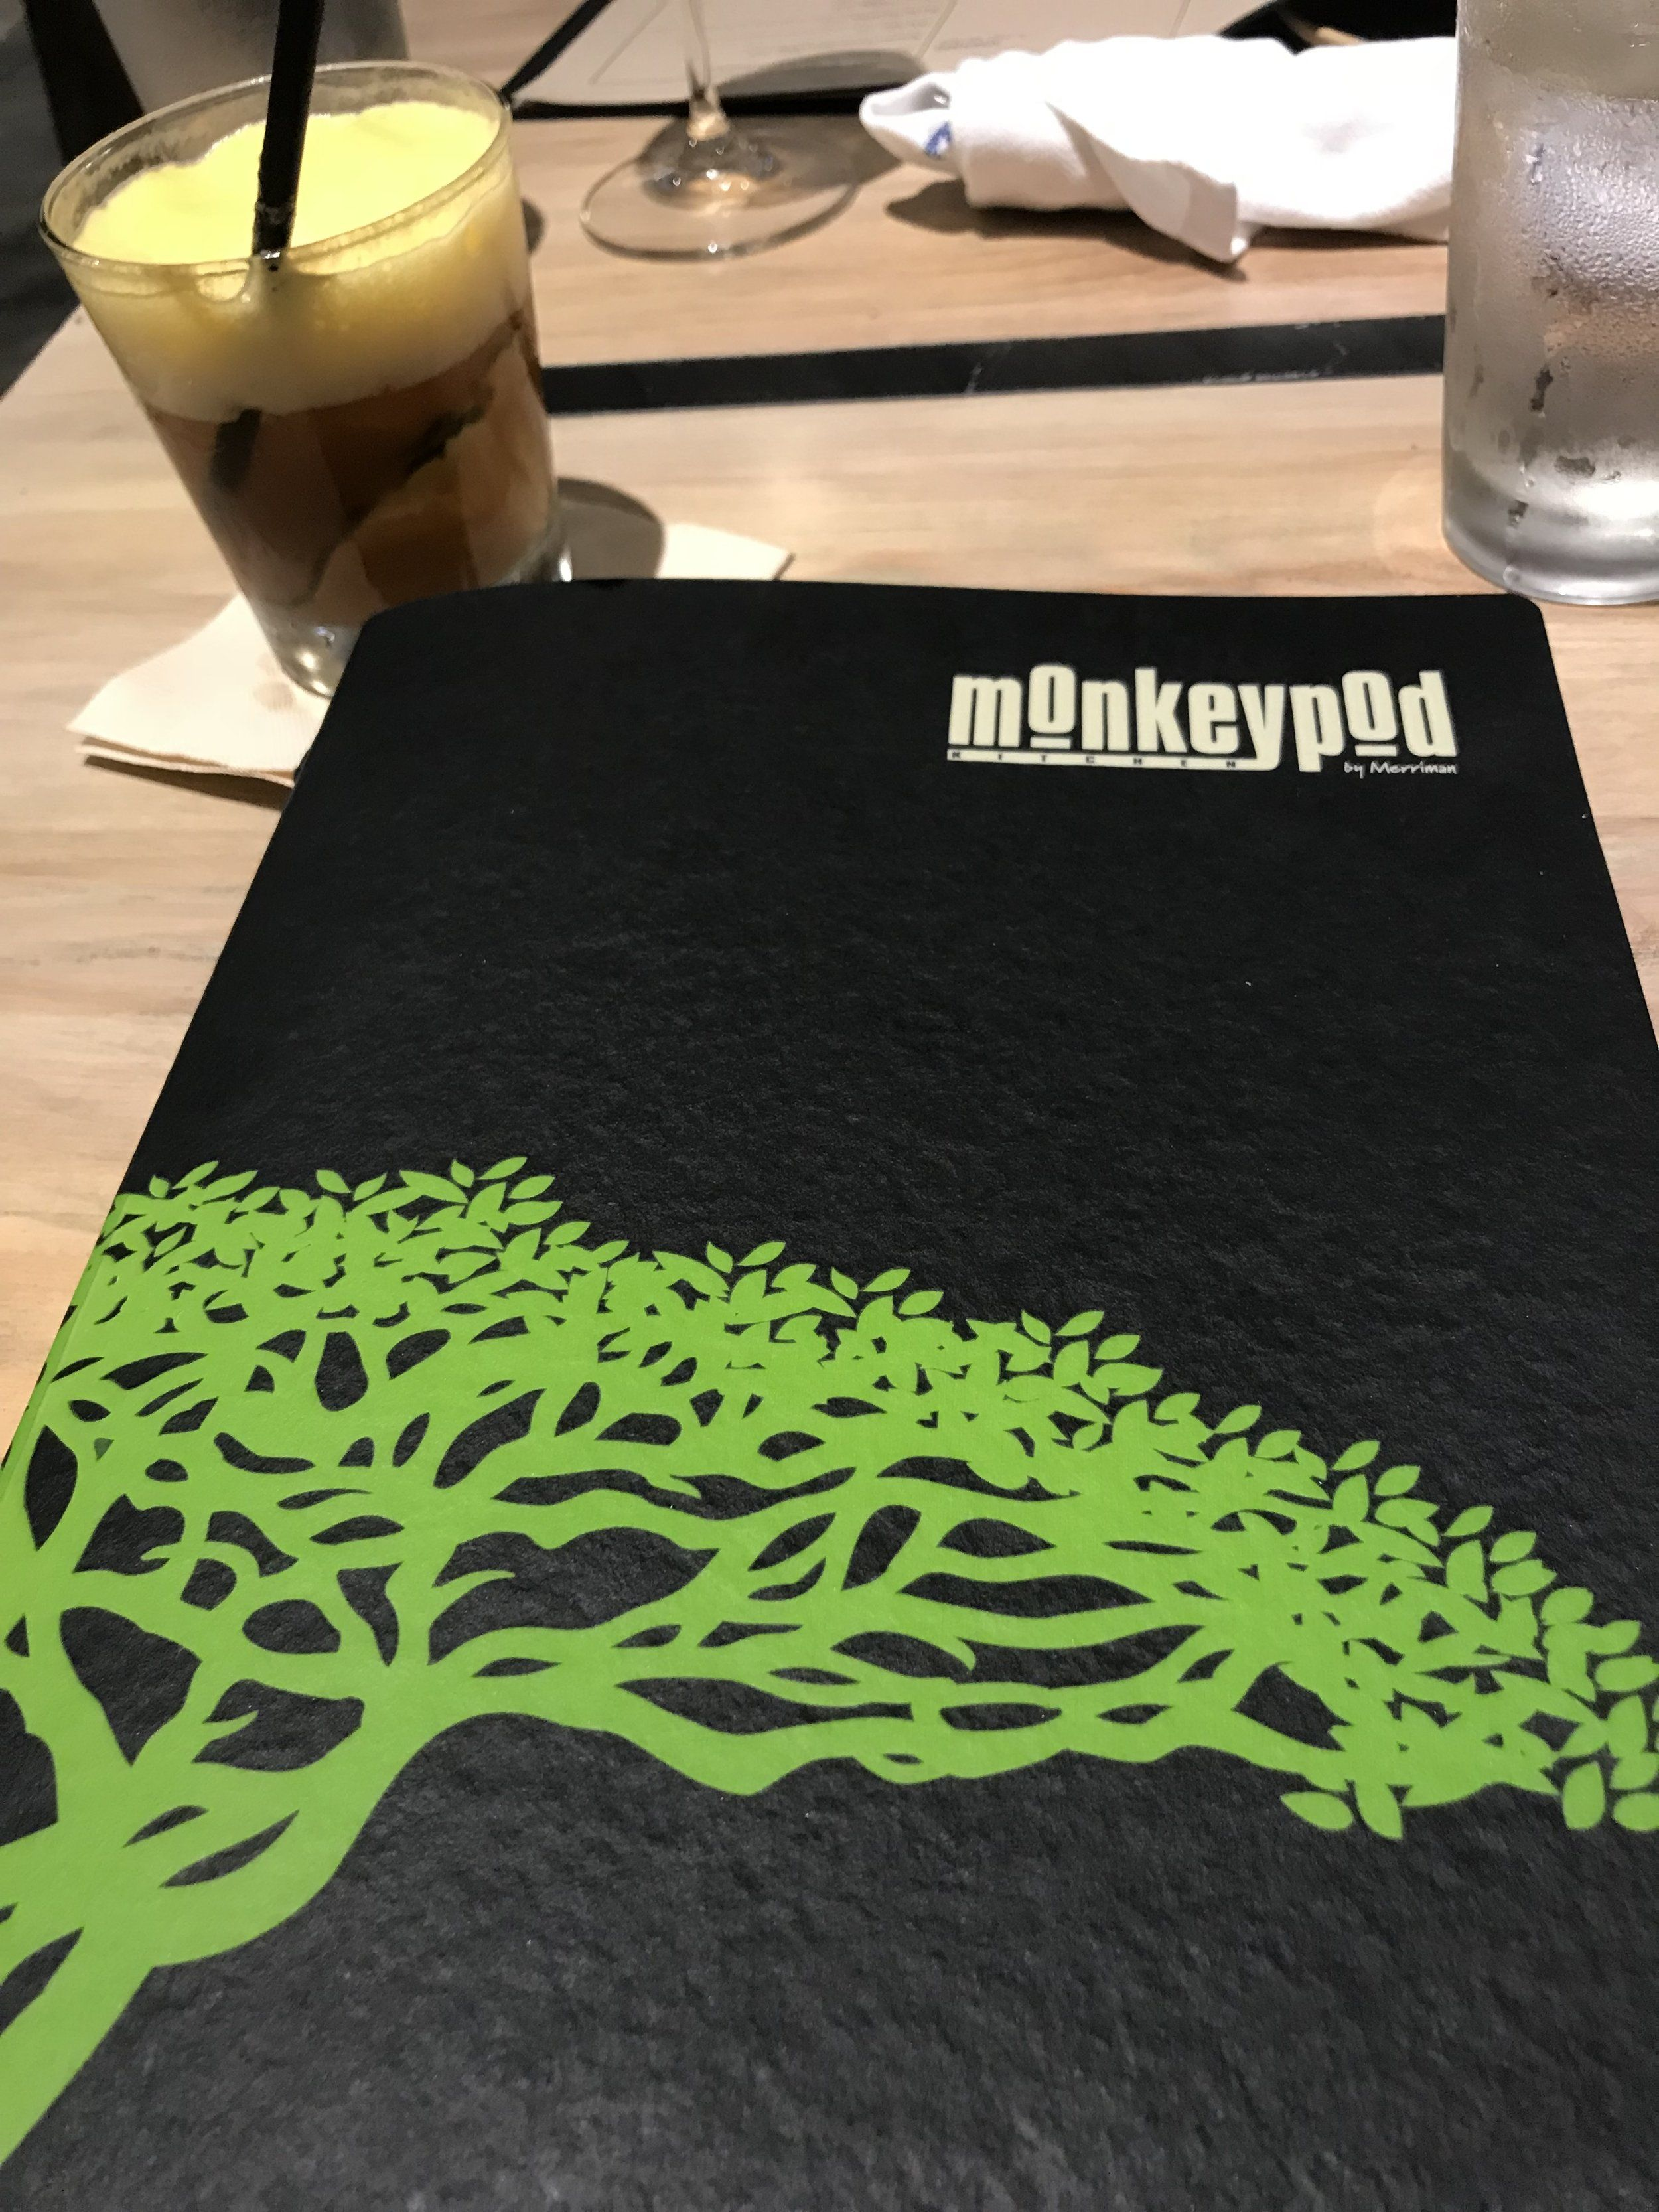 RESTAURANT REVIEW: Monkeypod Kitchen in Kaanapali - Maui ...